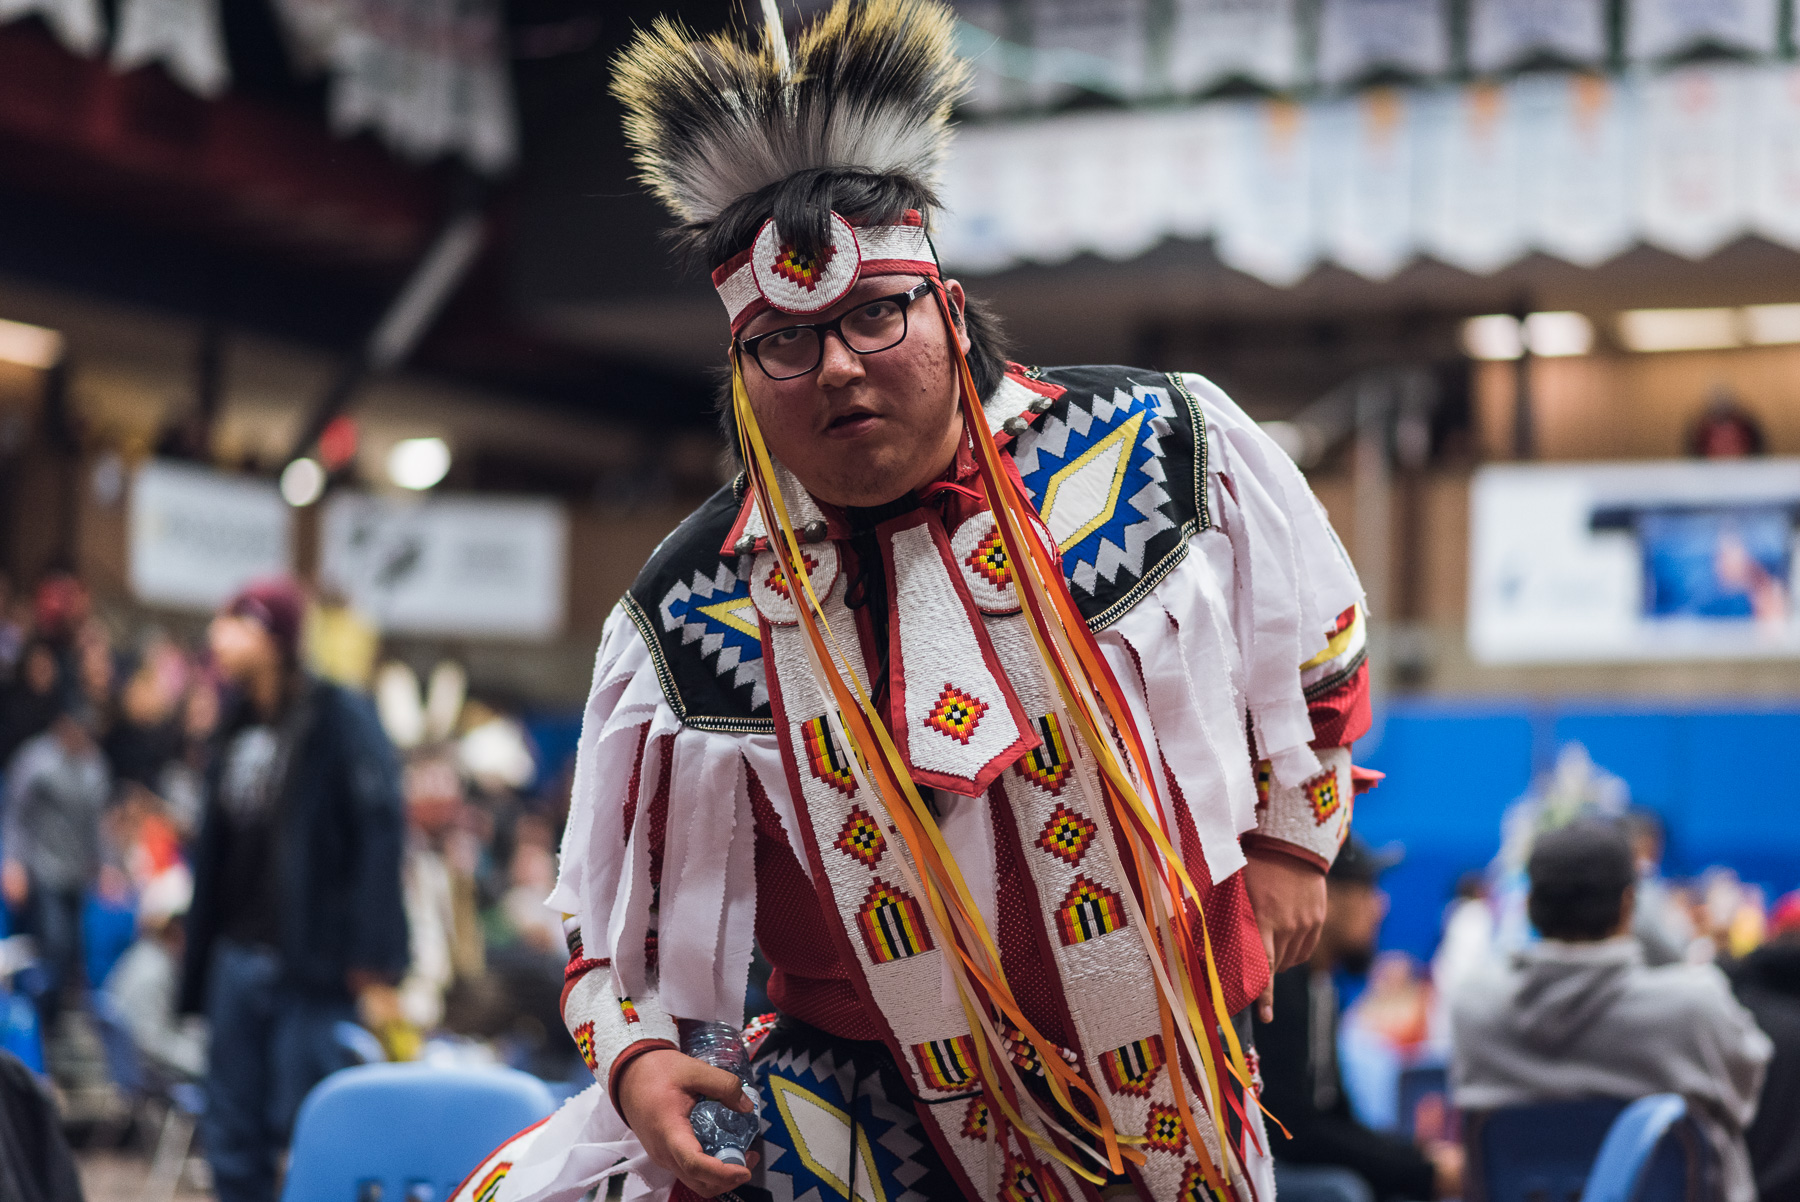 31st-Annual-LUNSA-Powwow-Blog-115.jpg